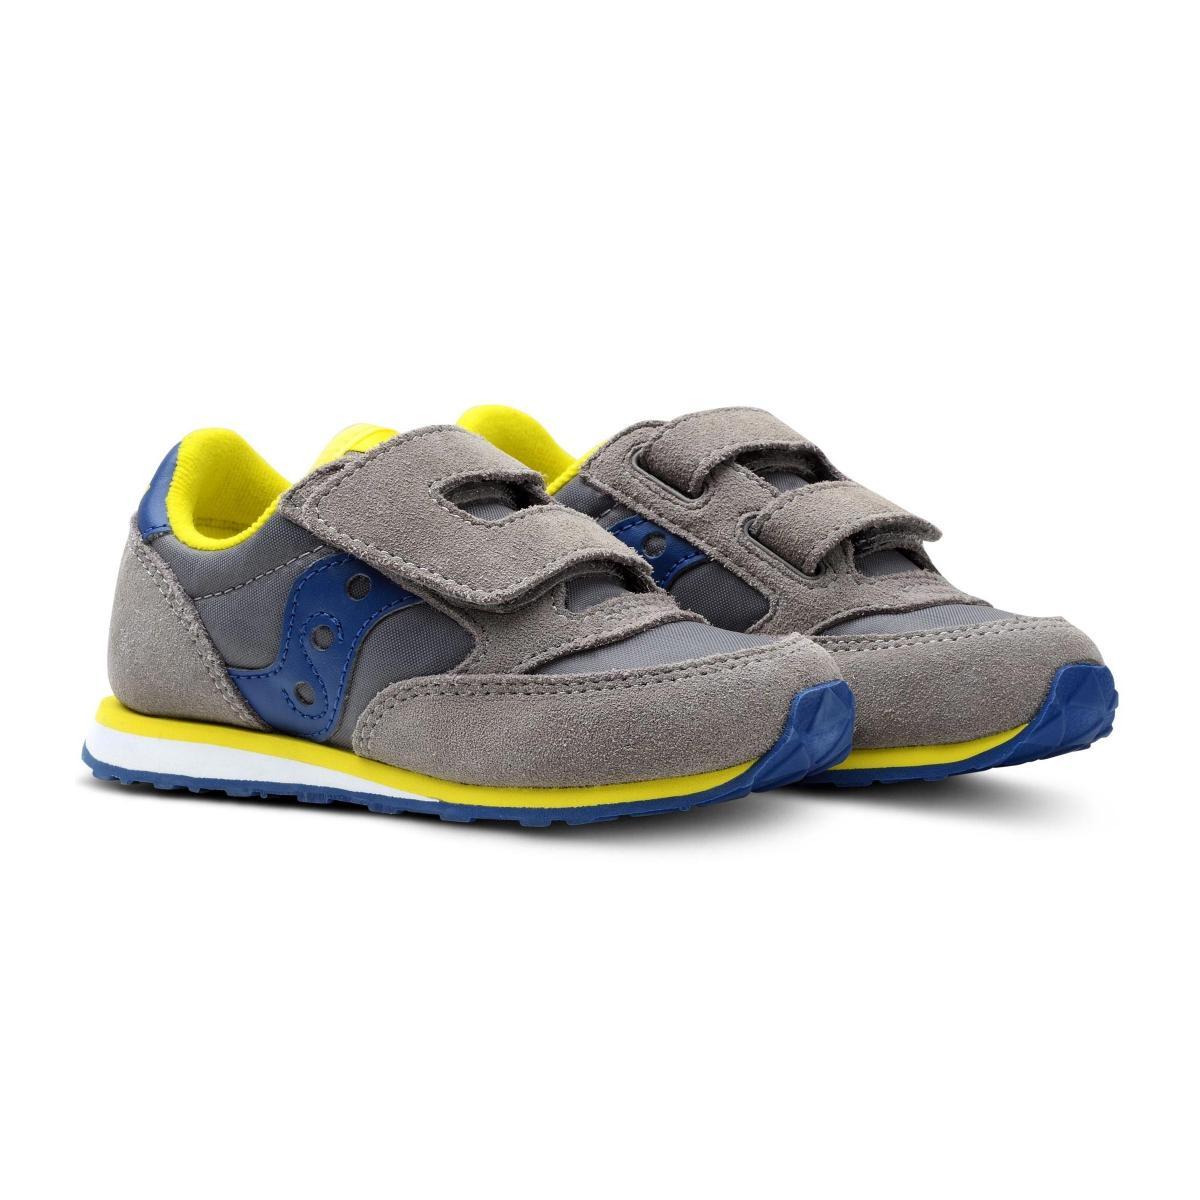 Sneakers Saucony BABY JAZZ HL GREY/BLUE da bimbo rif. SL261033